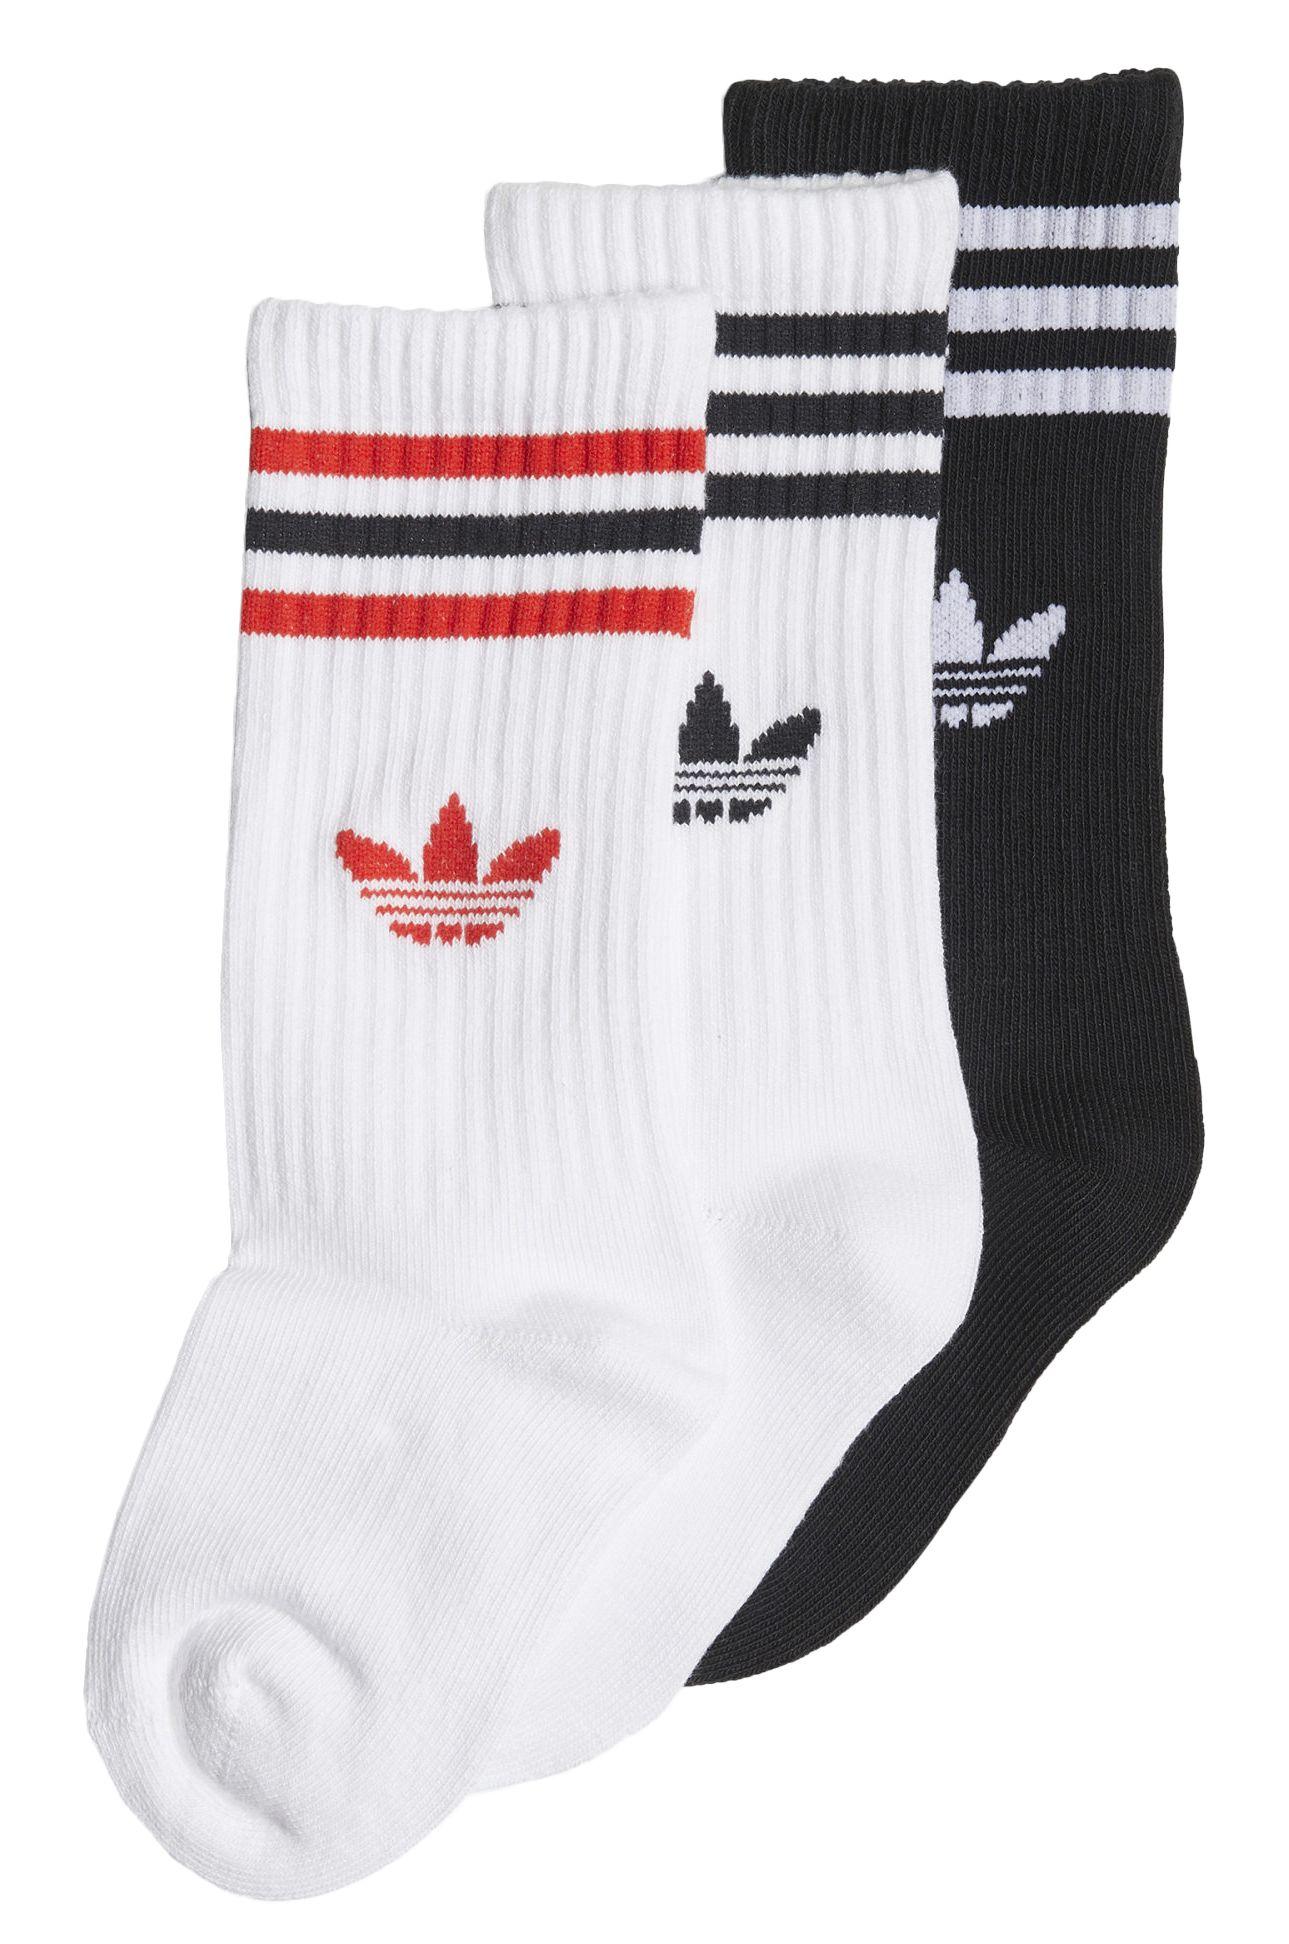 Adidas Socks CREW SOCK 3P White/White/Black